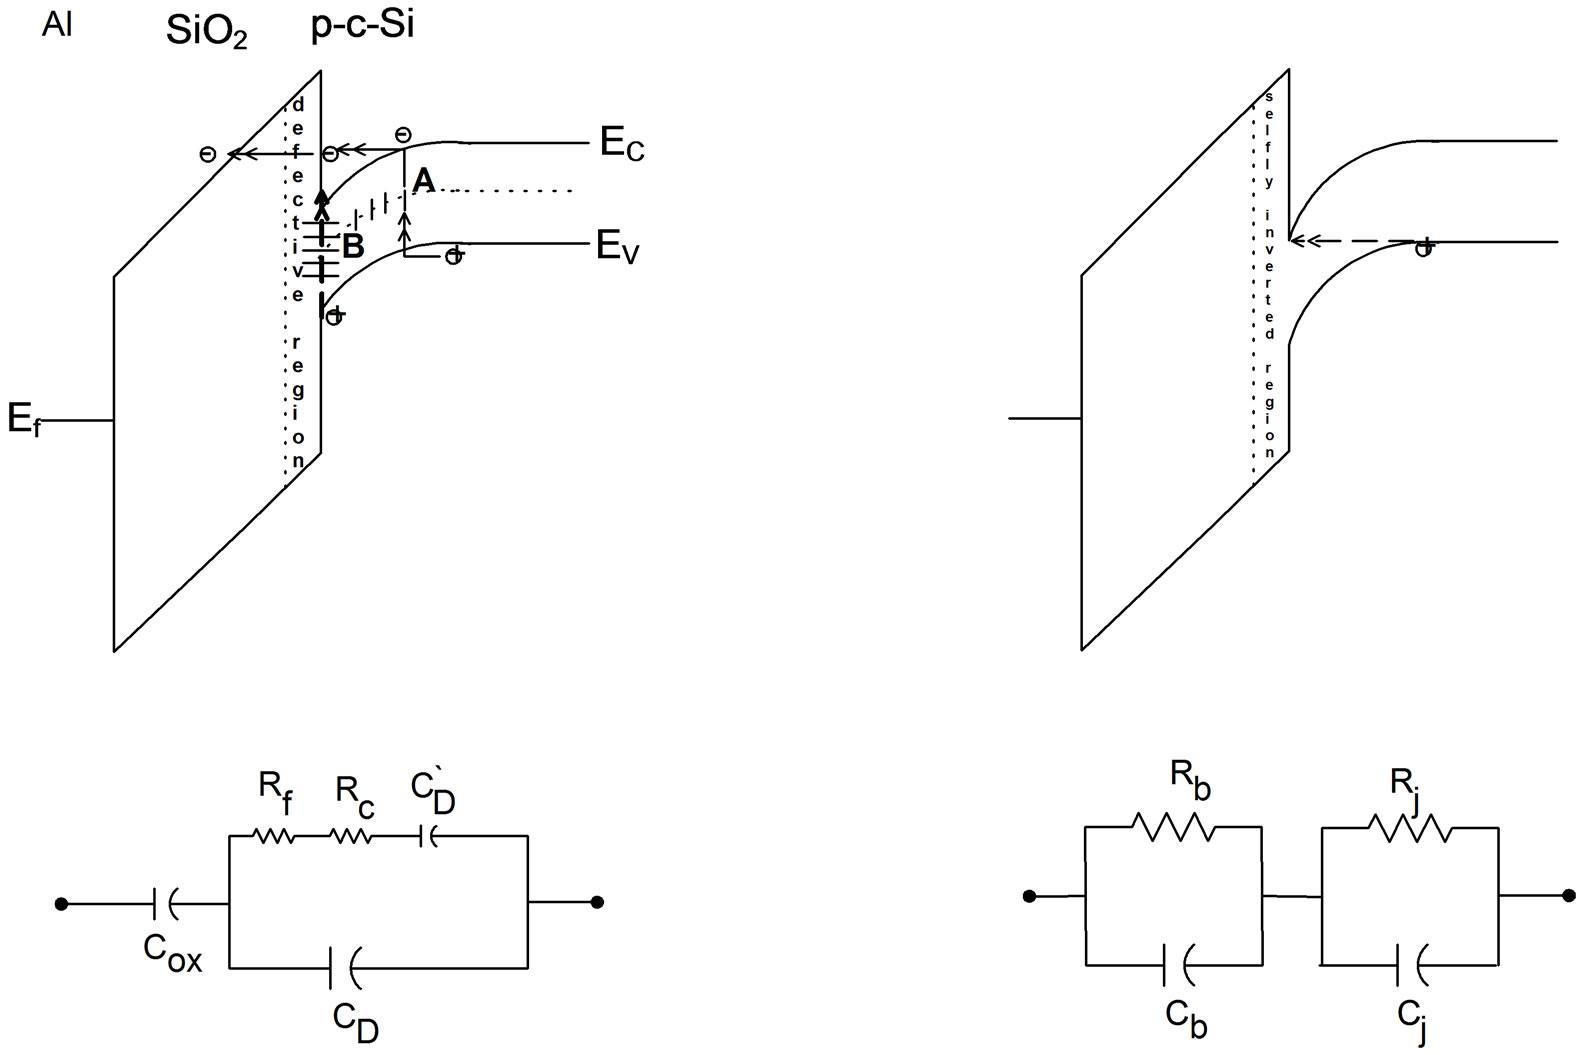 Kawasaki Zx7 Cdi Wiring Diagram Yamaha Fz1 Wiring Diagram